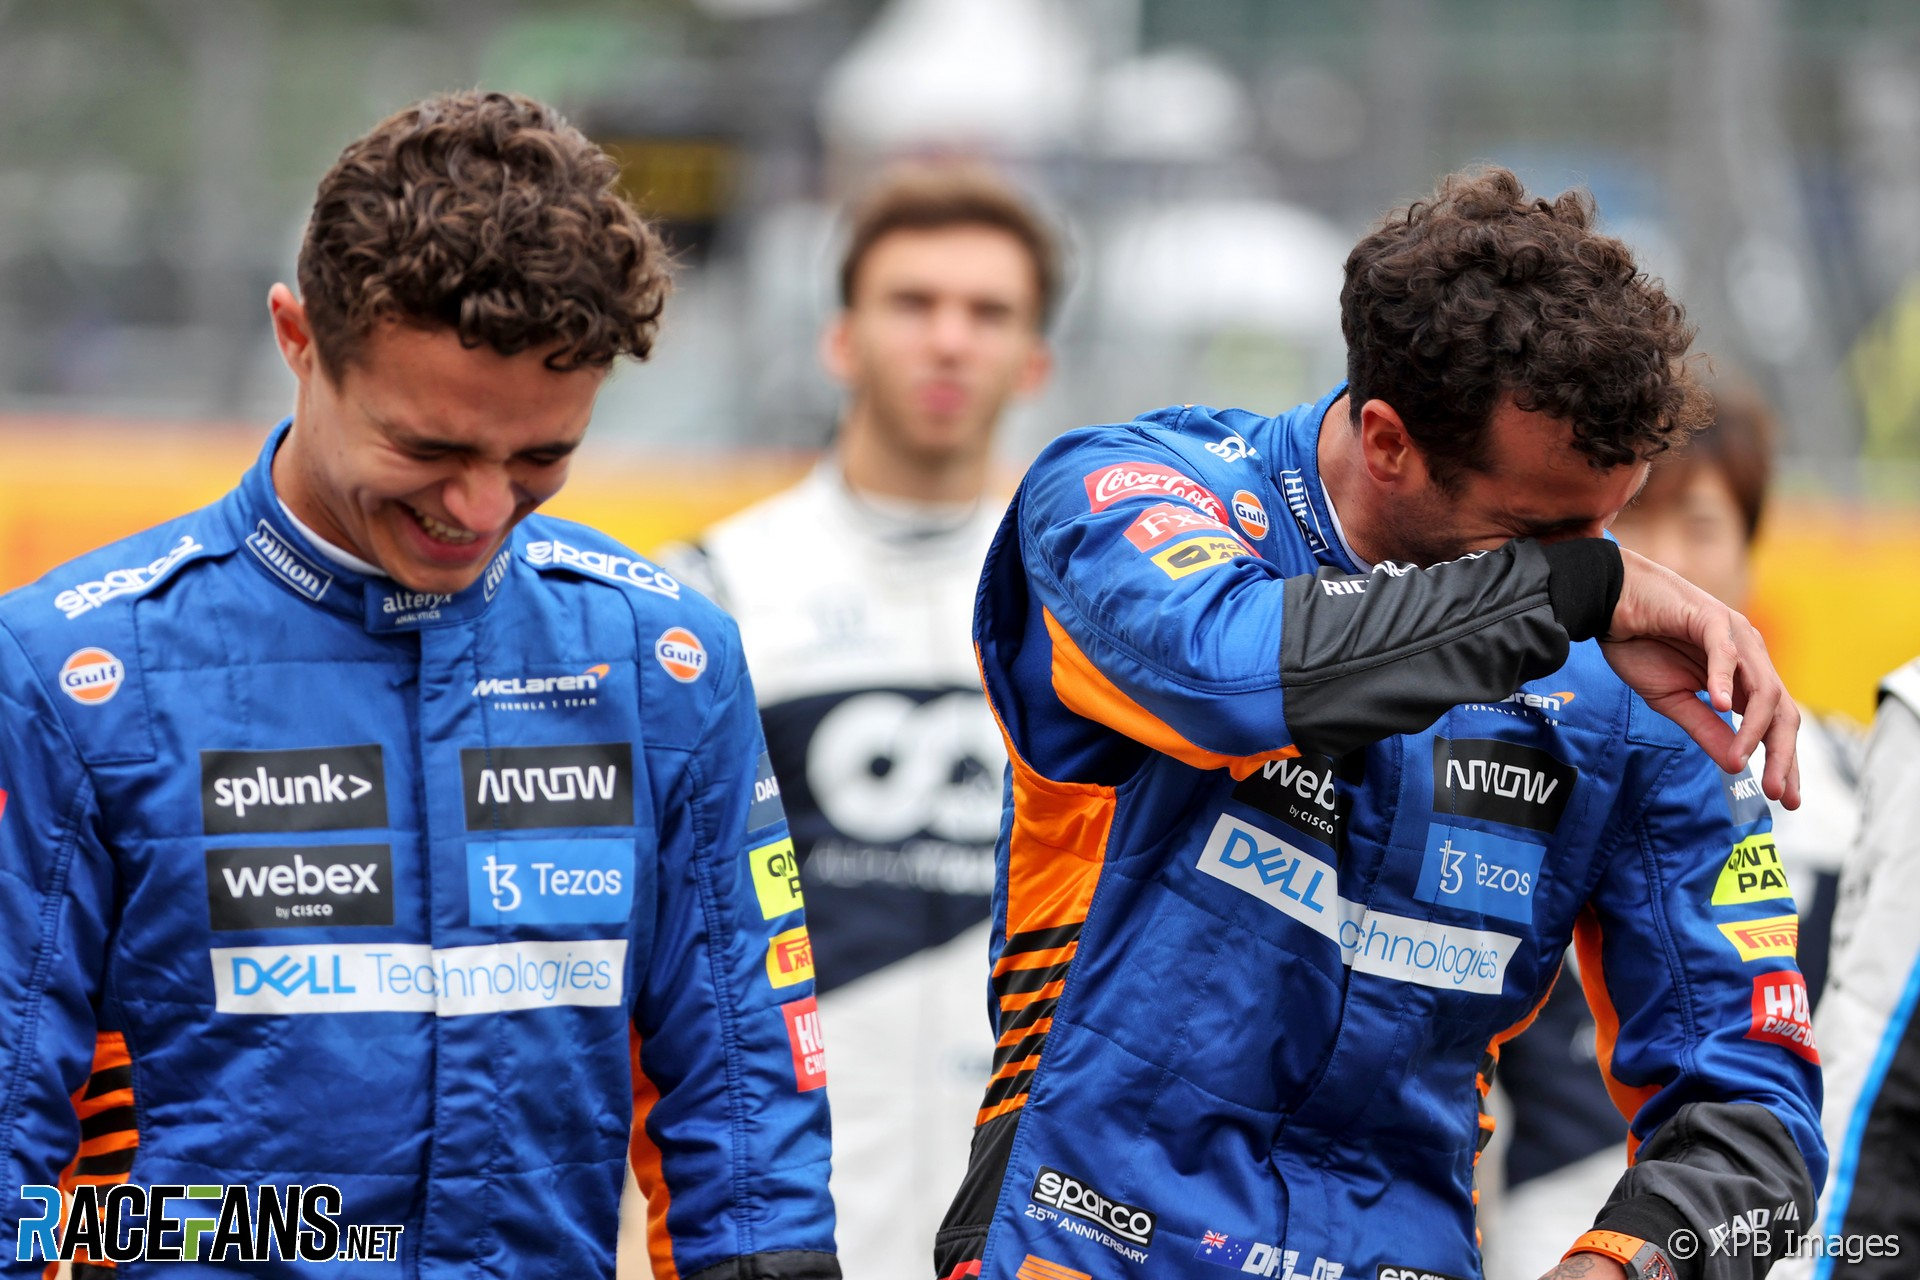 Lando Norris, Daniel Ricciardo, McLaren, Silverstone, 2021